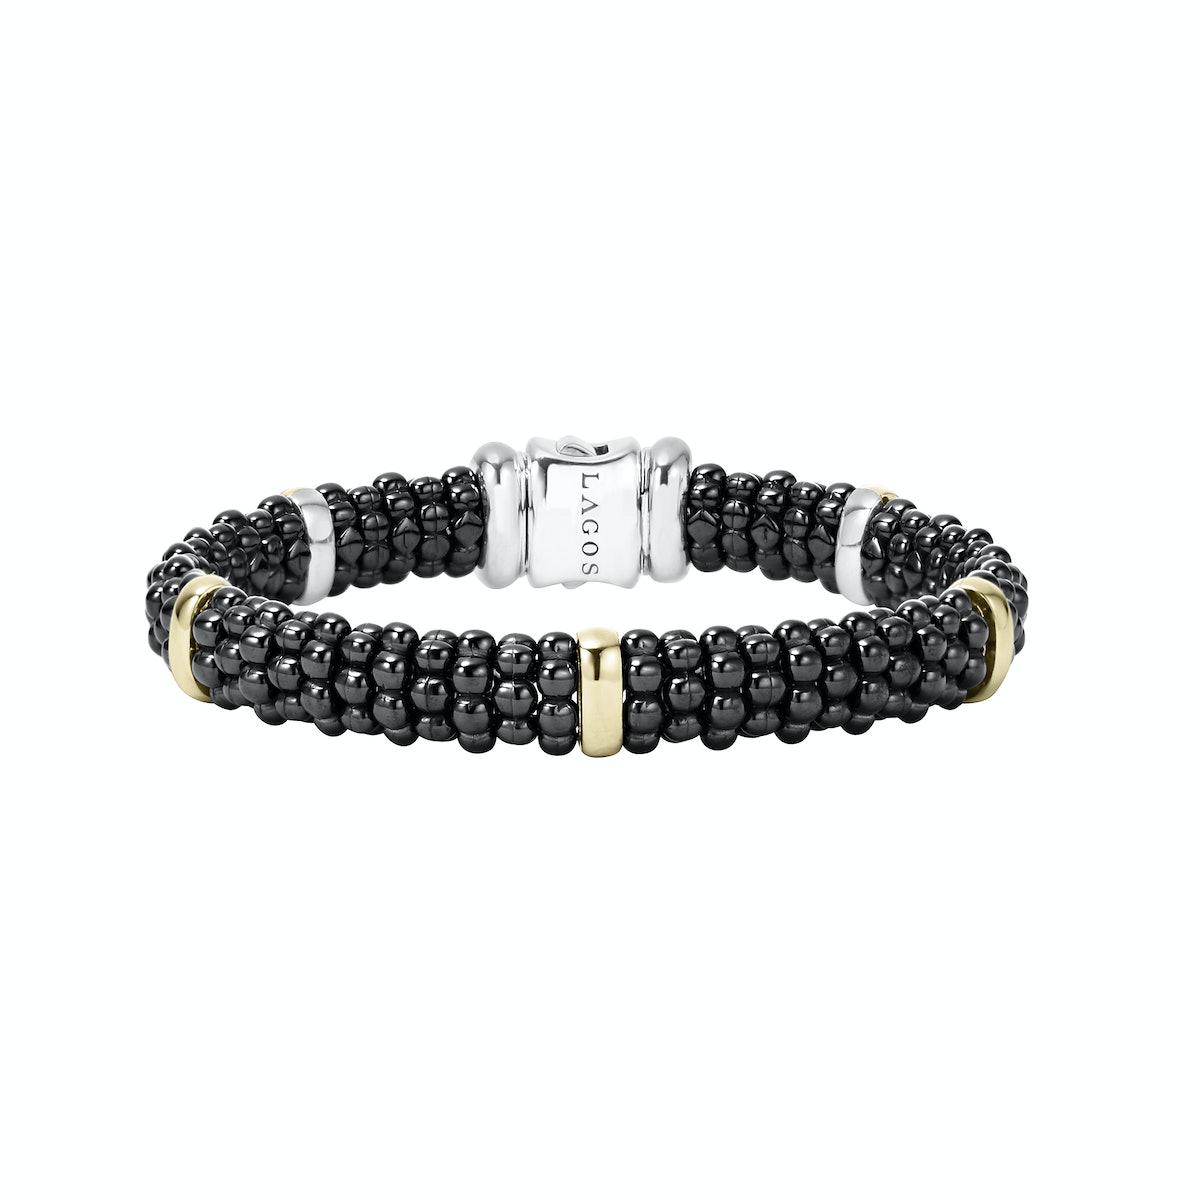 Lagos 18k gold and ceramic Black Caviar bracelet